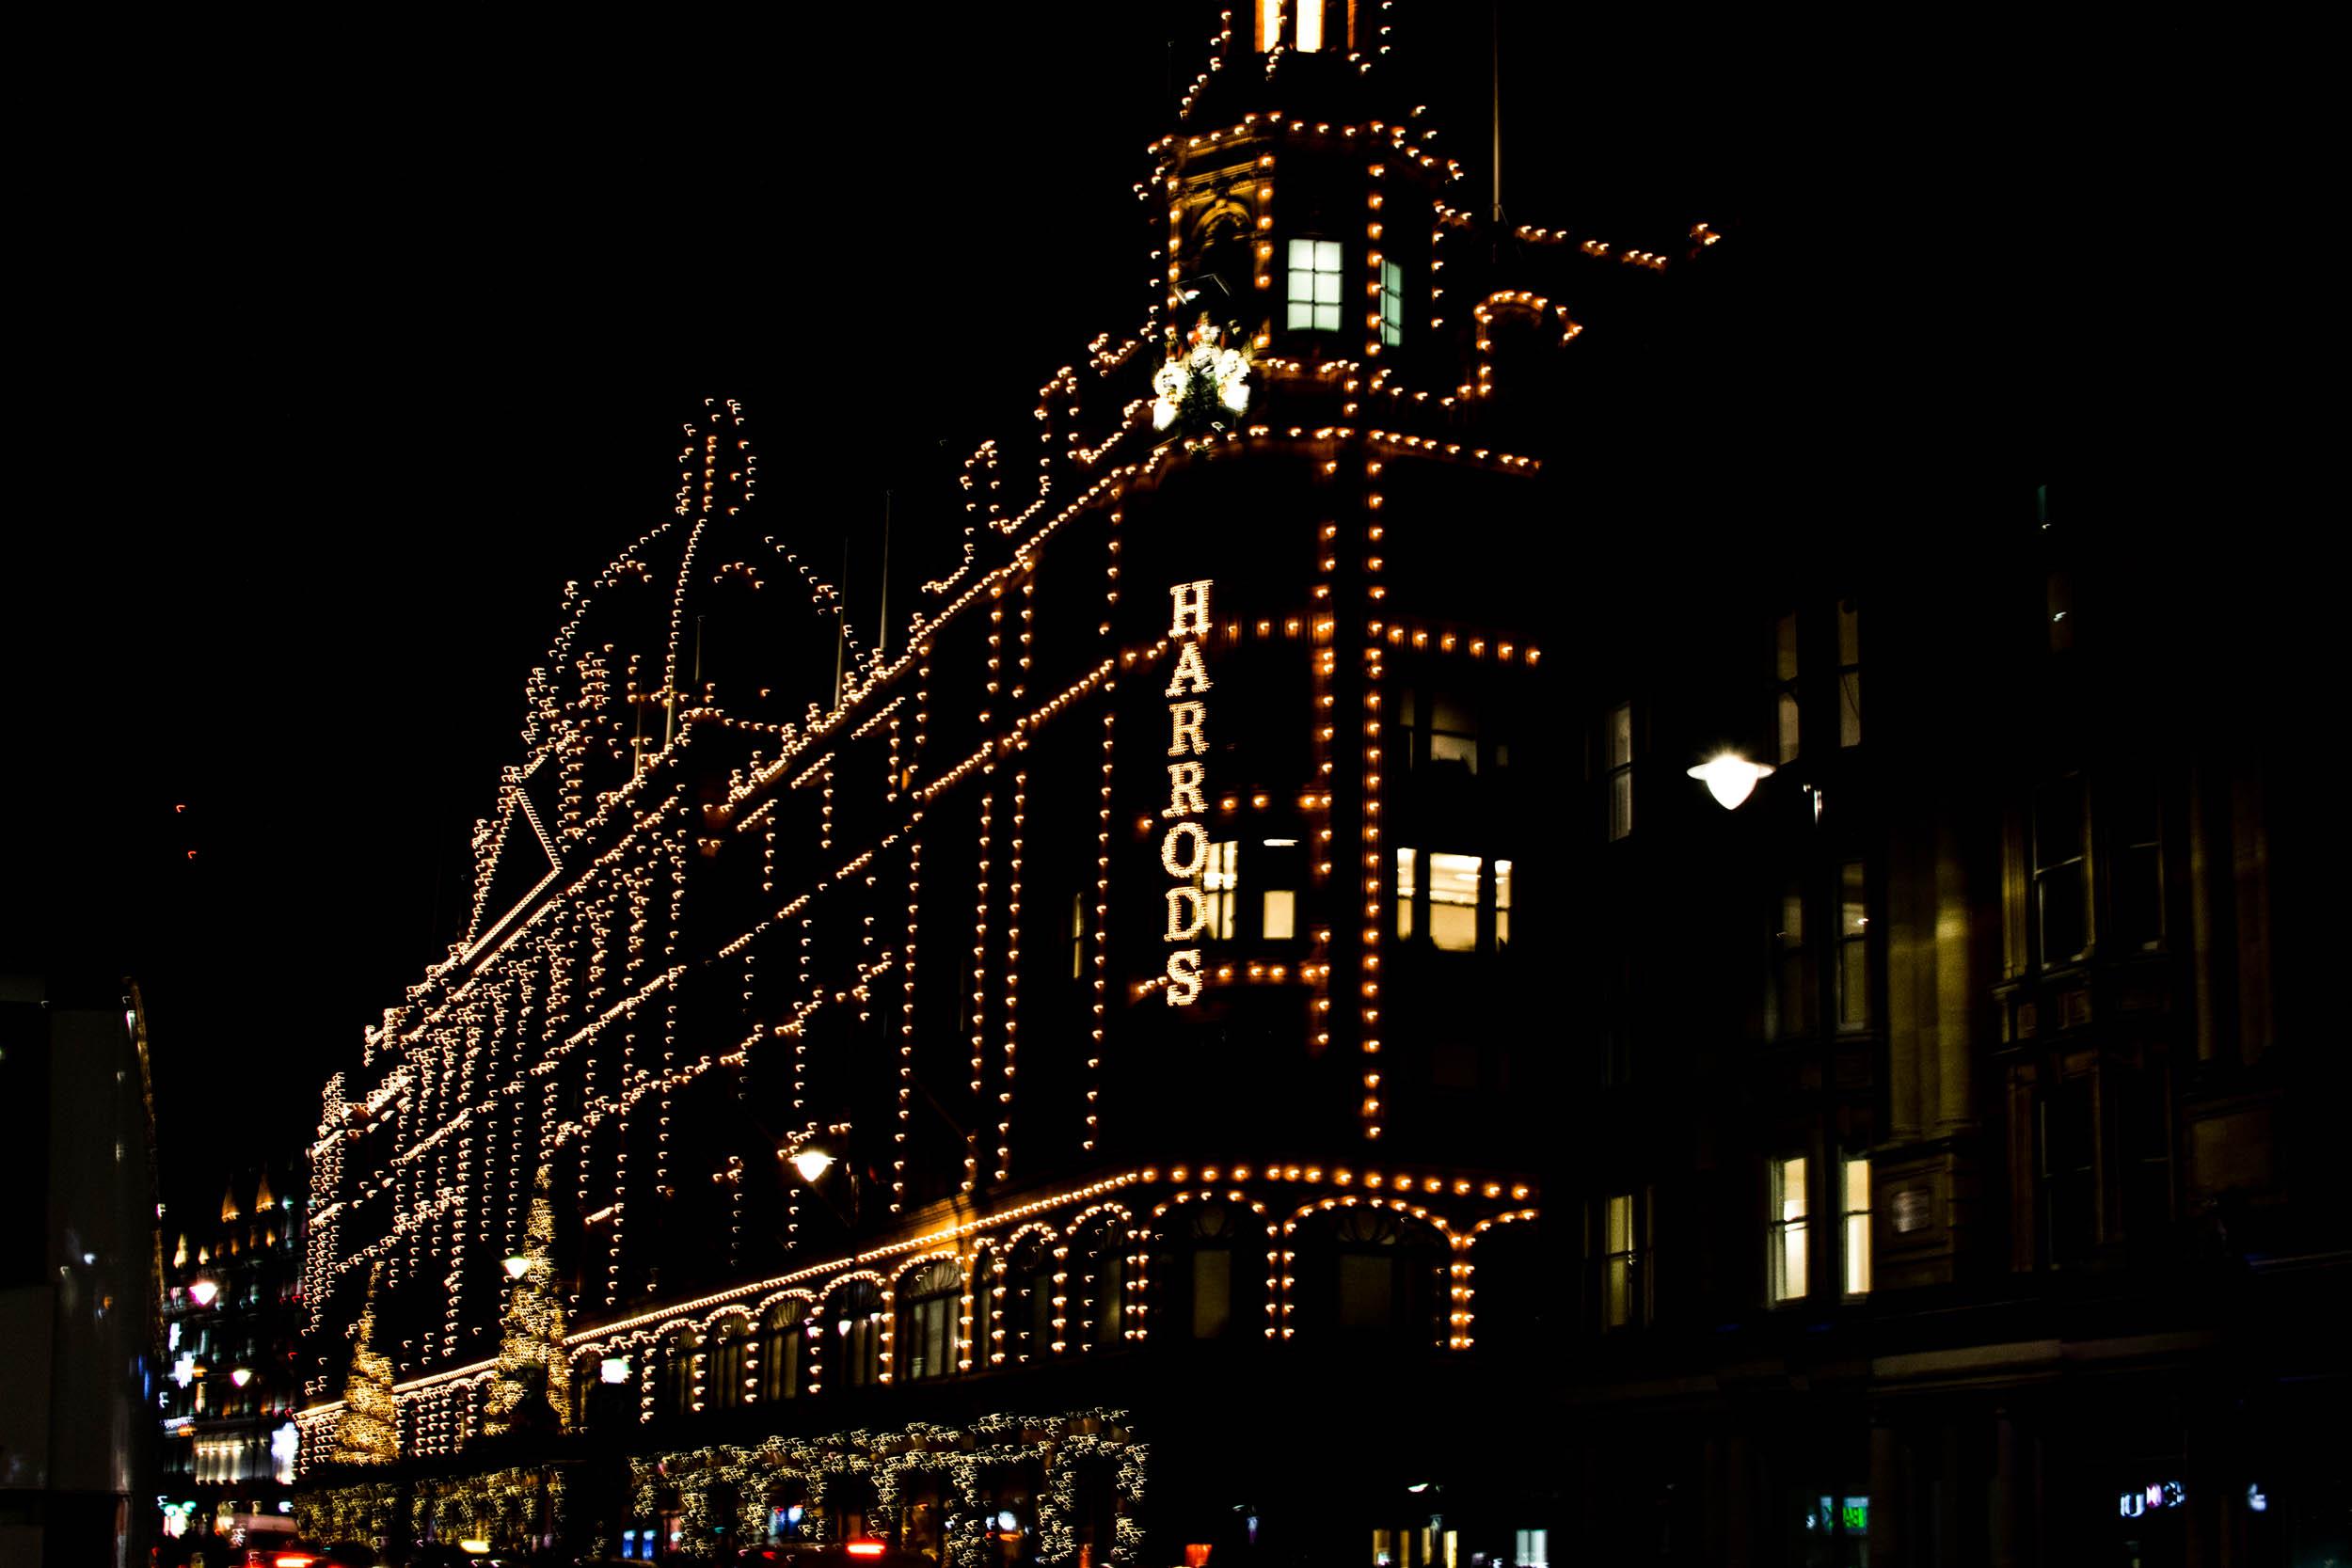 Harrods luxury department store, London.